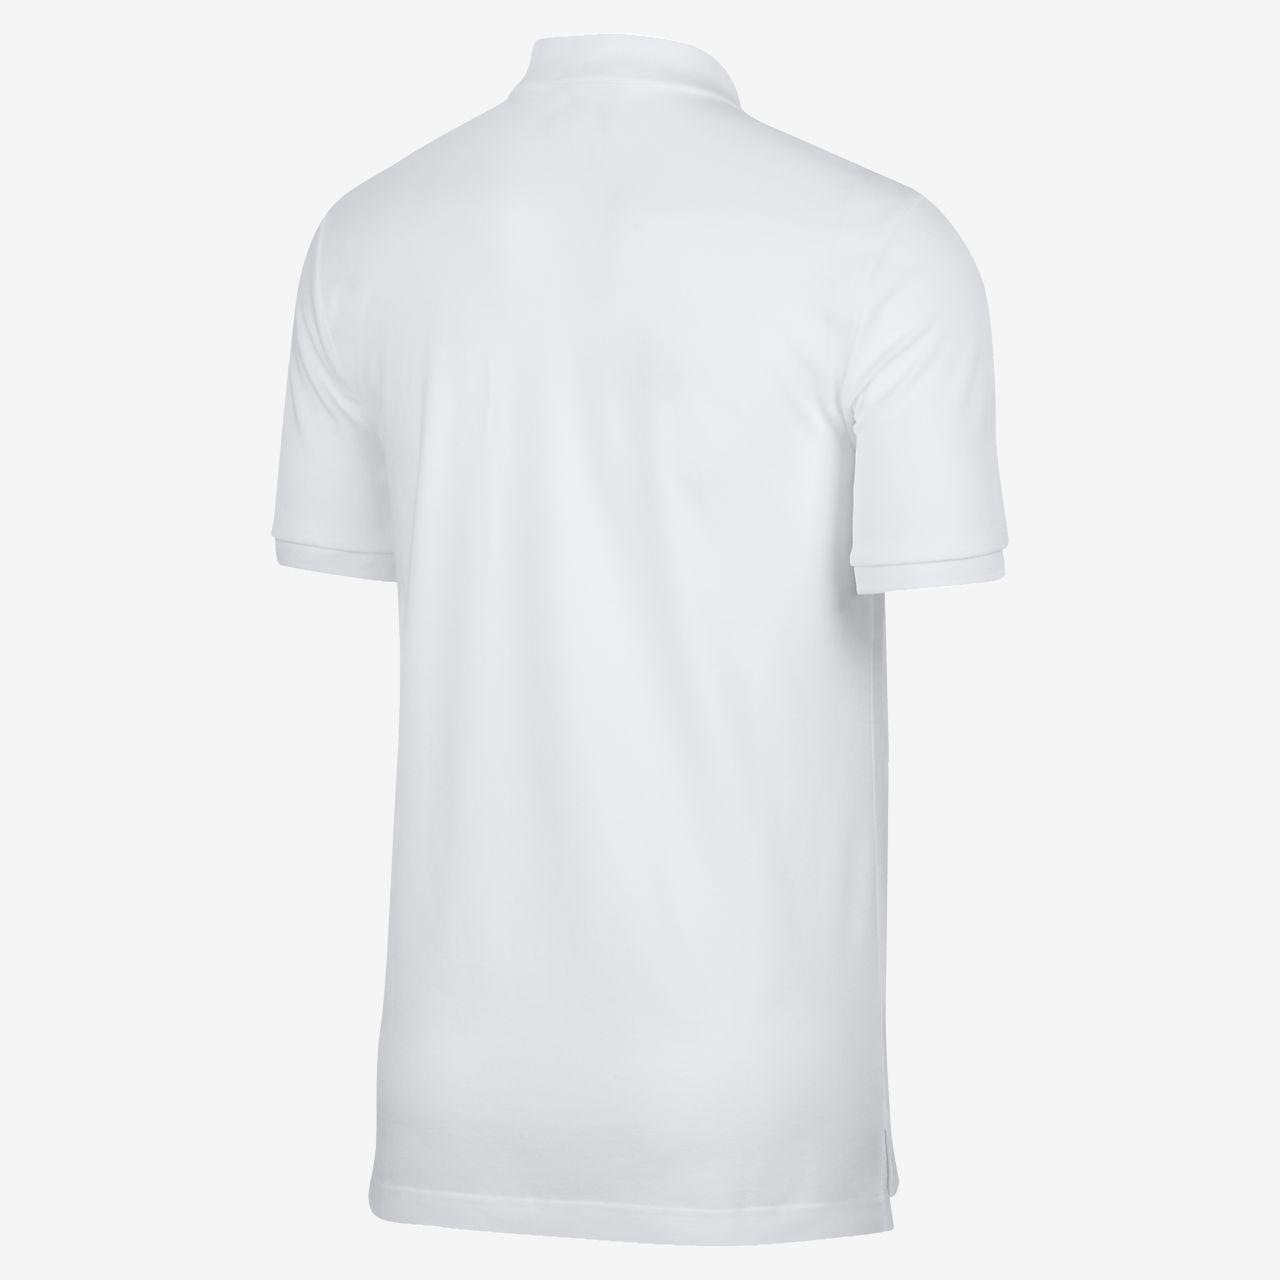 54f06aa5977c Low Resolution Ανδρική μπλούζα πόλο Poland Ανδρική μπλούζα πόλο Poland